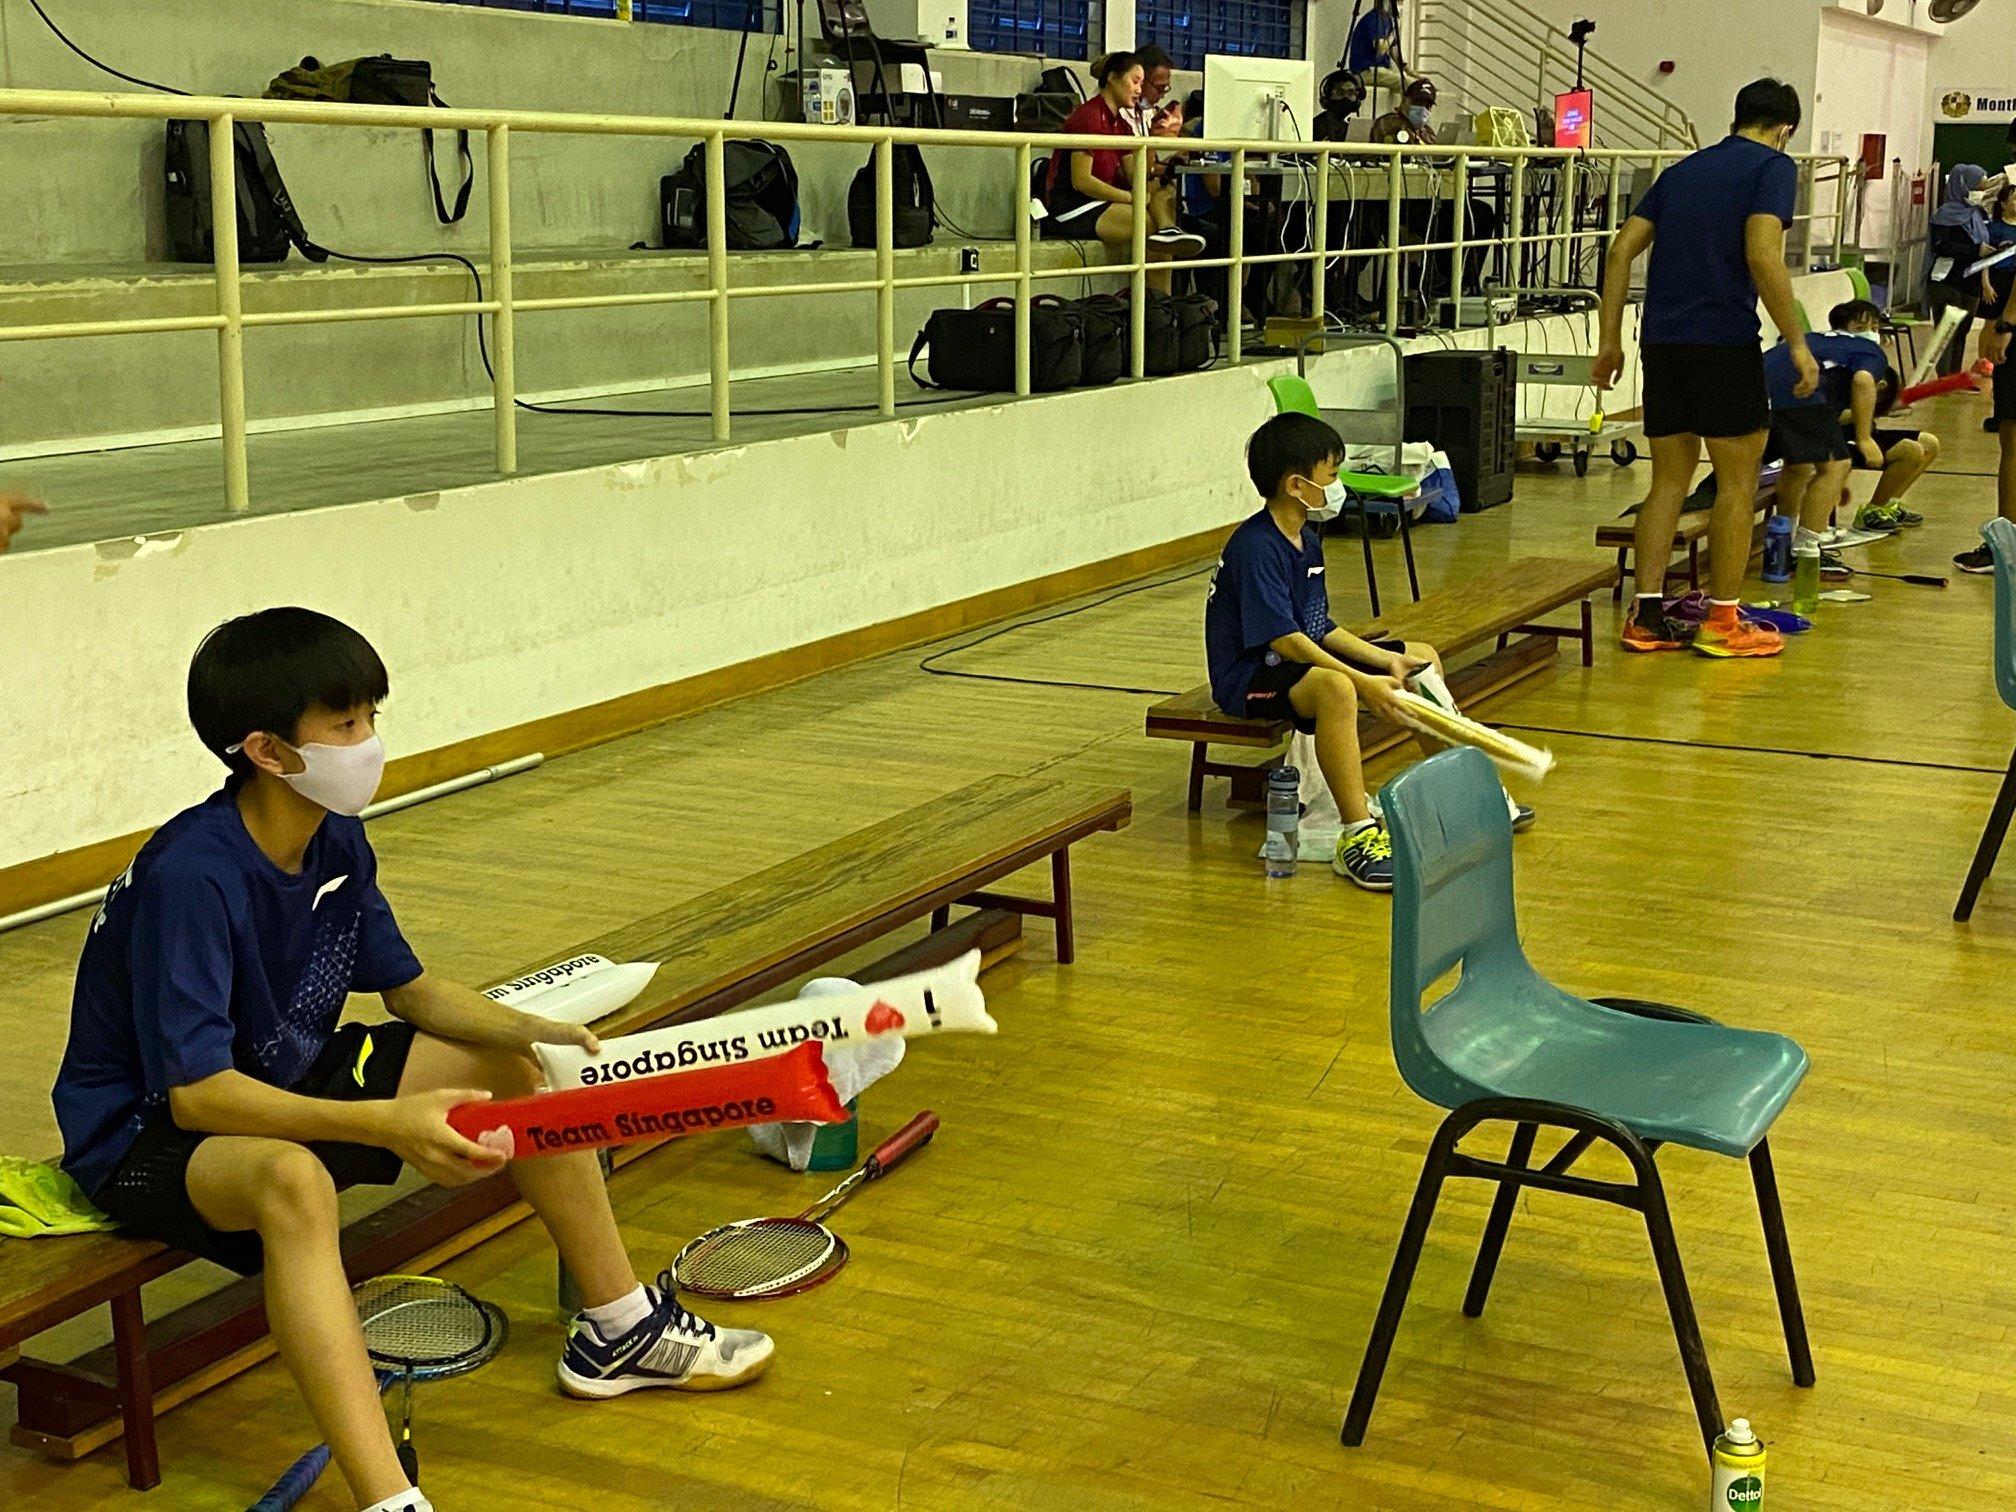 NSG Snr Div North Zone boys' badminton final - teammates with clappers